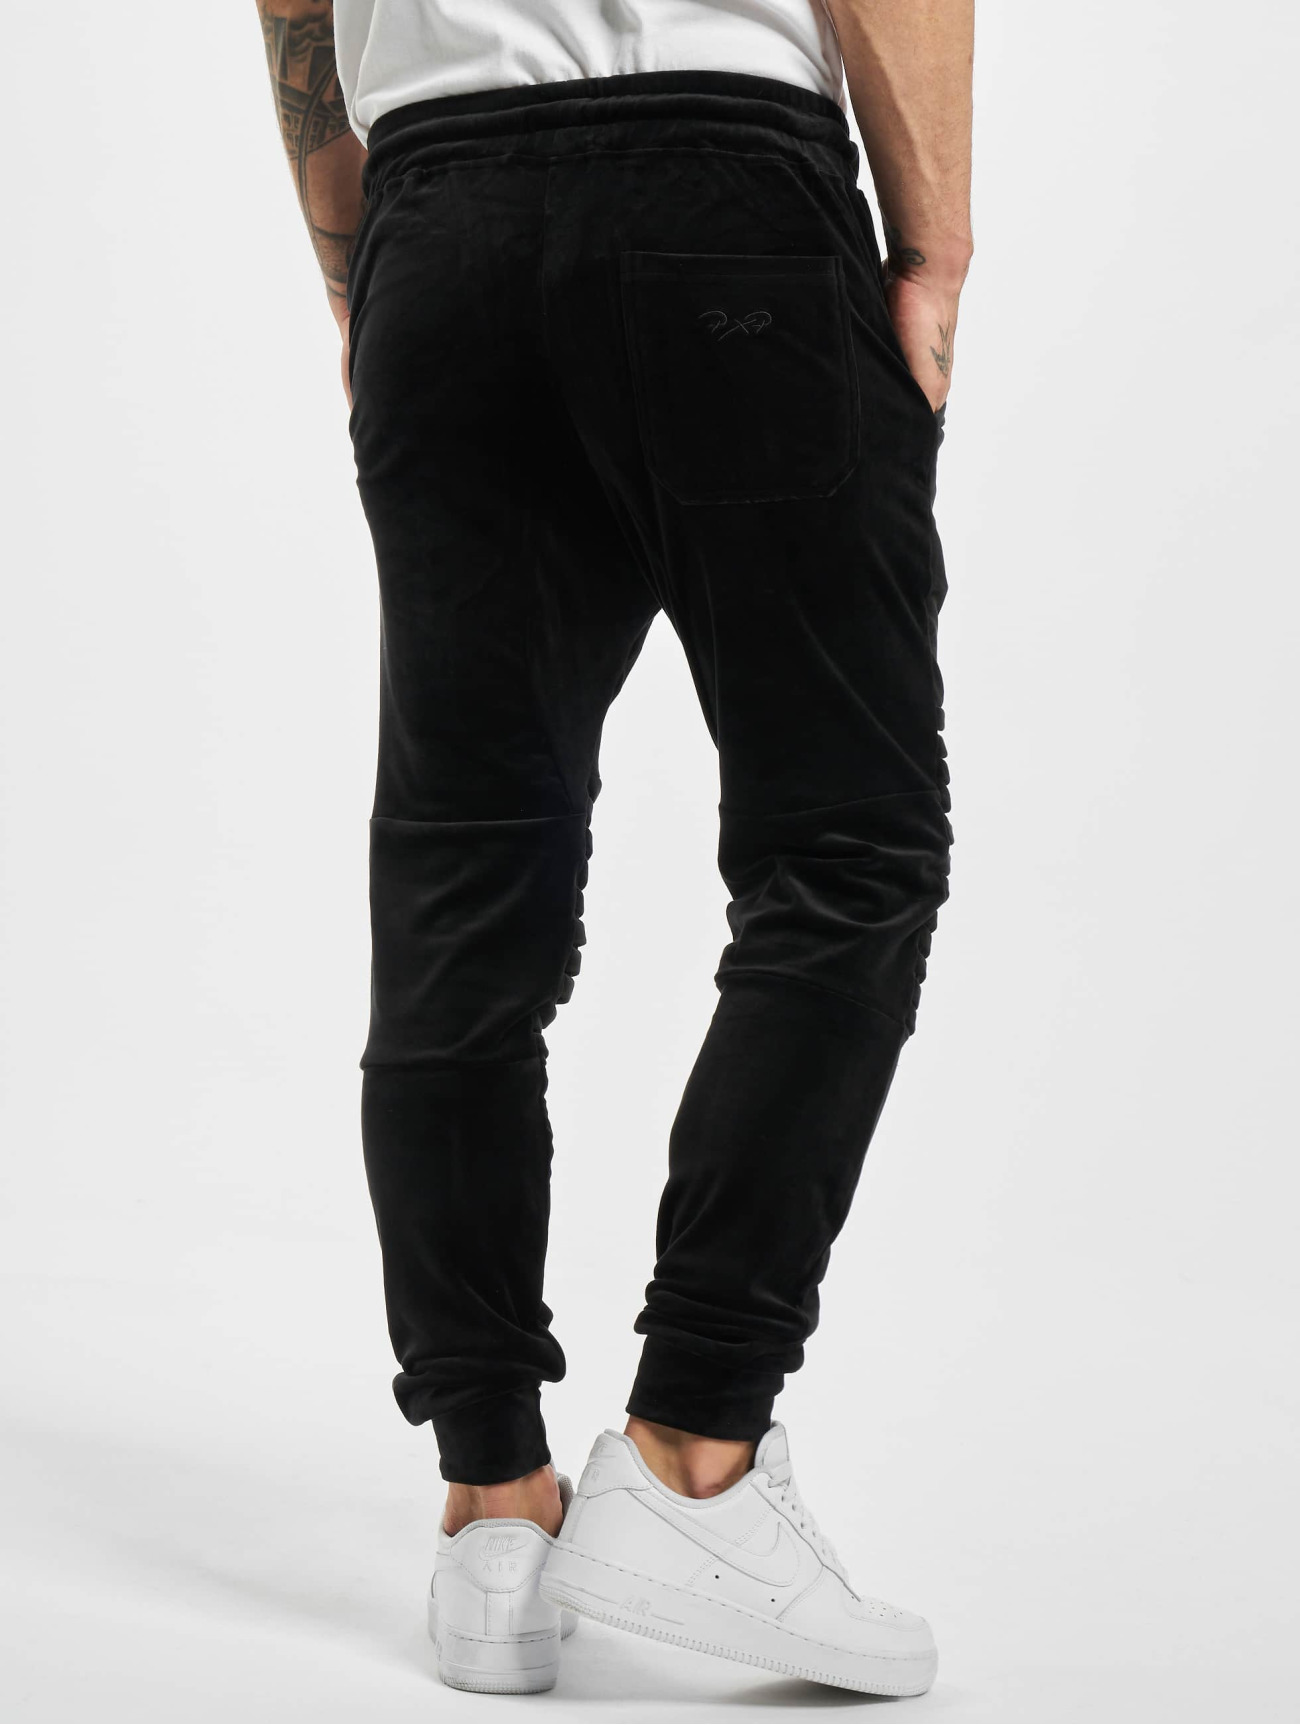 Pantalone ginnico Jogger Reell Jeans Uomo Pantaloni